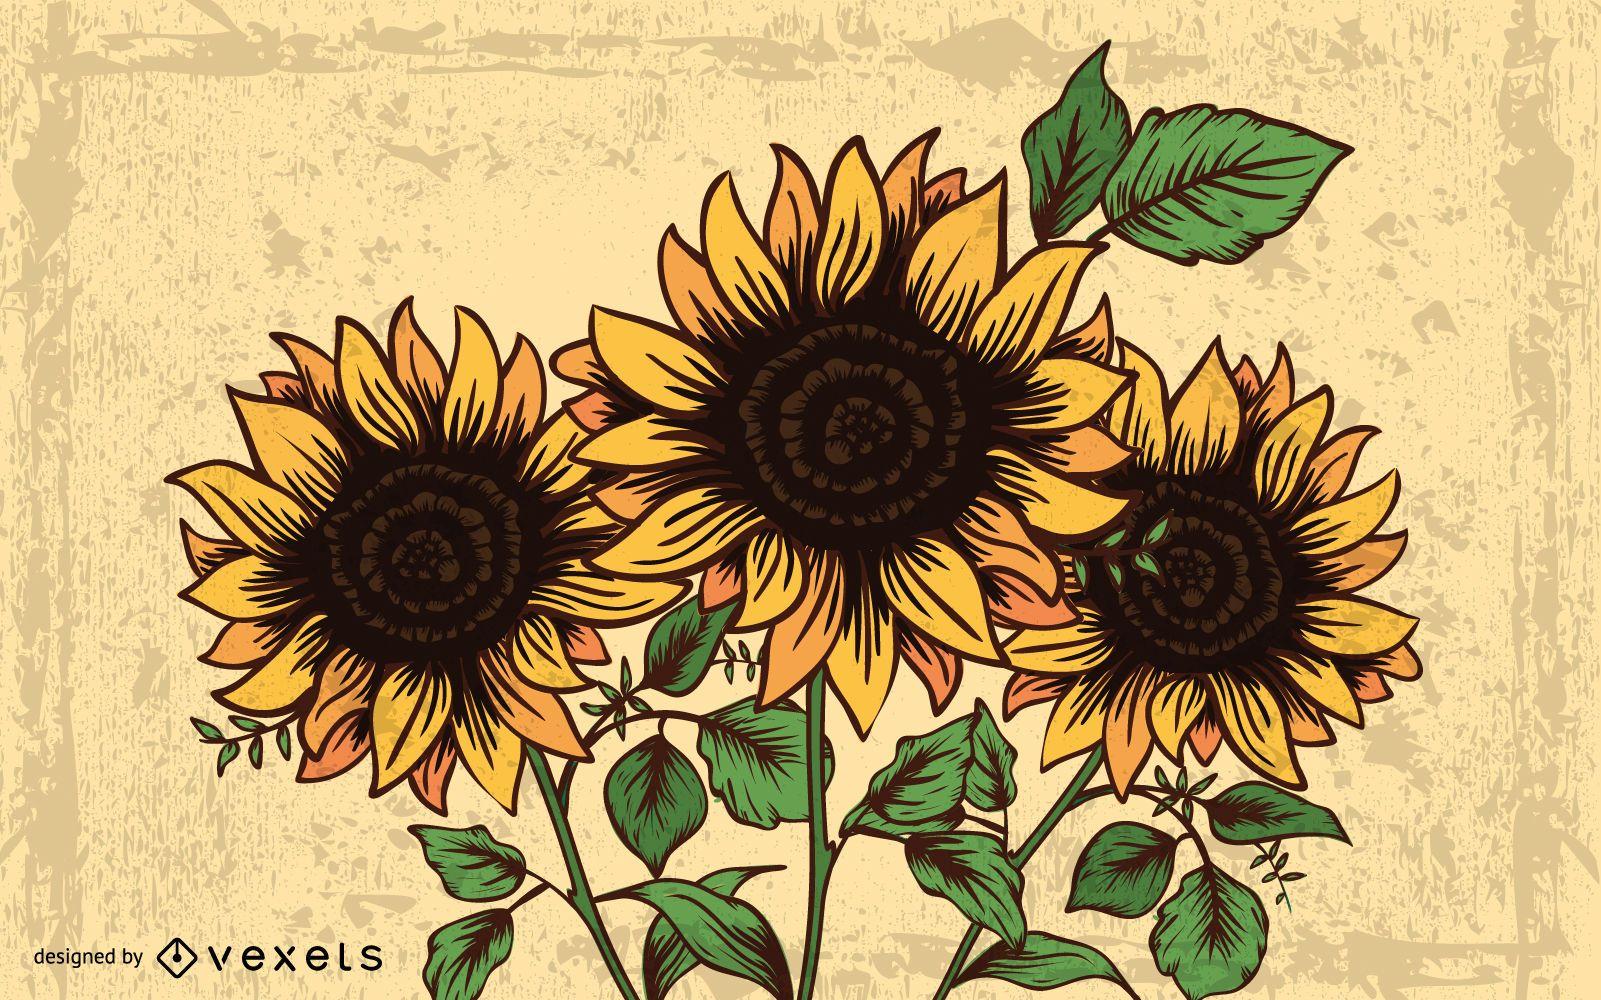 Summer Dream Artwork with Sunflower